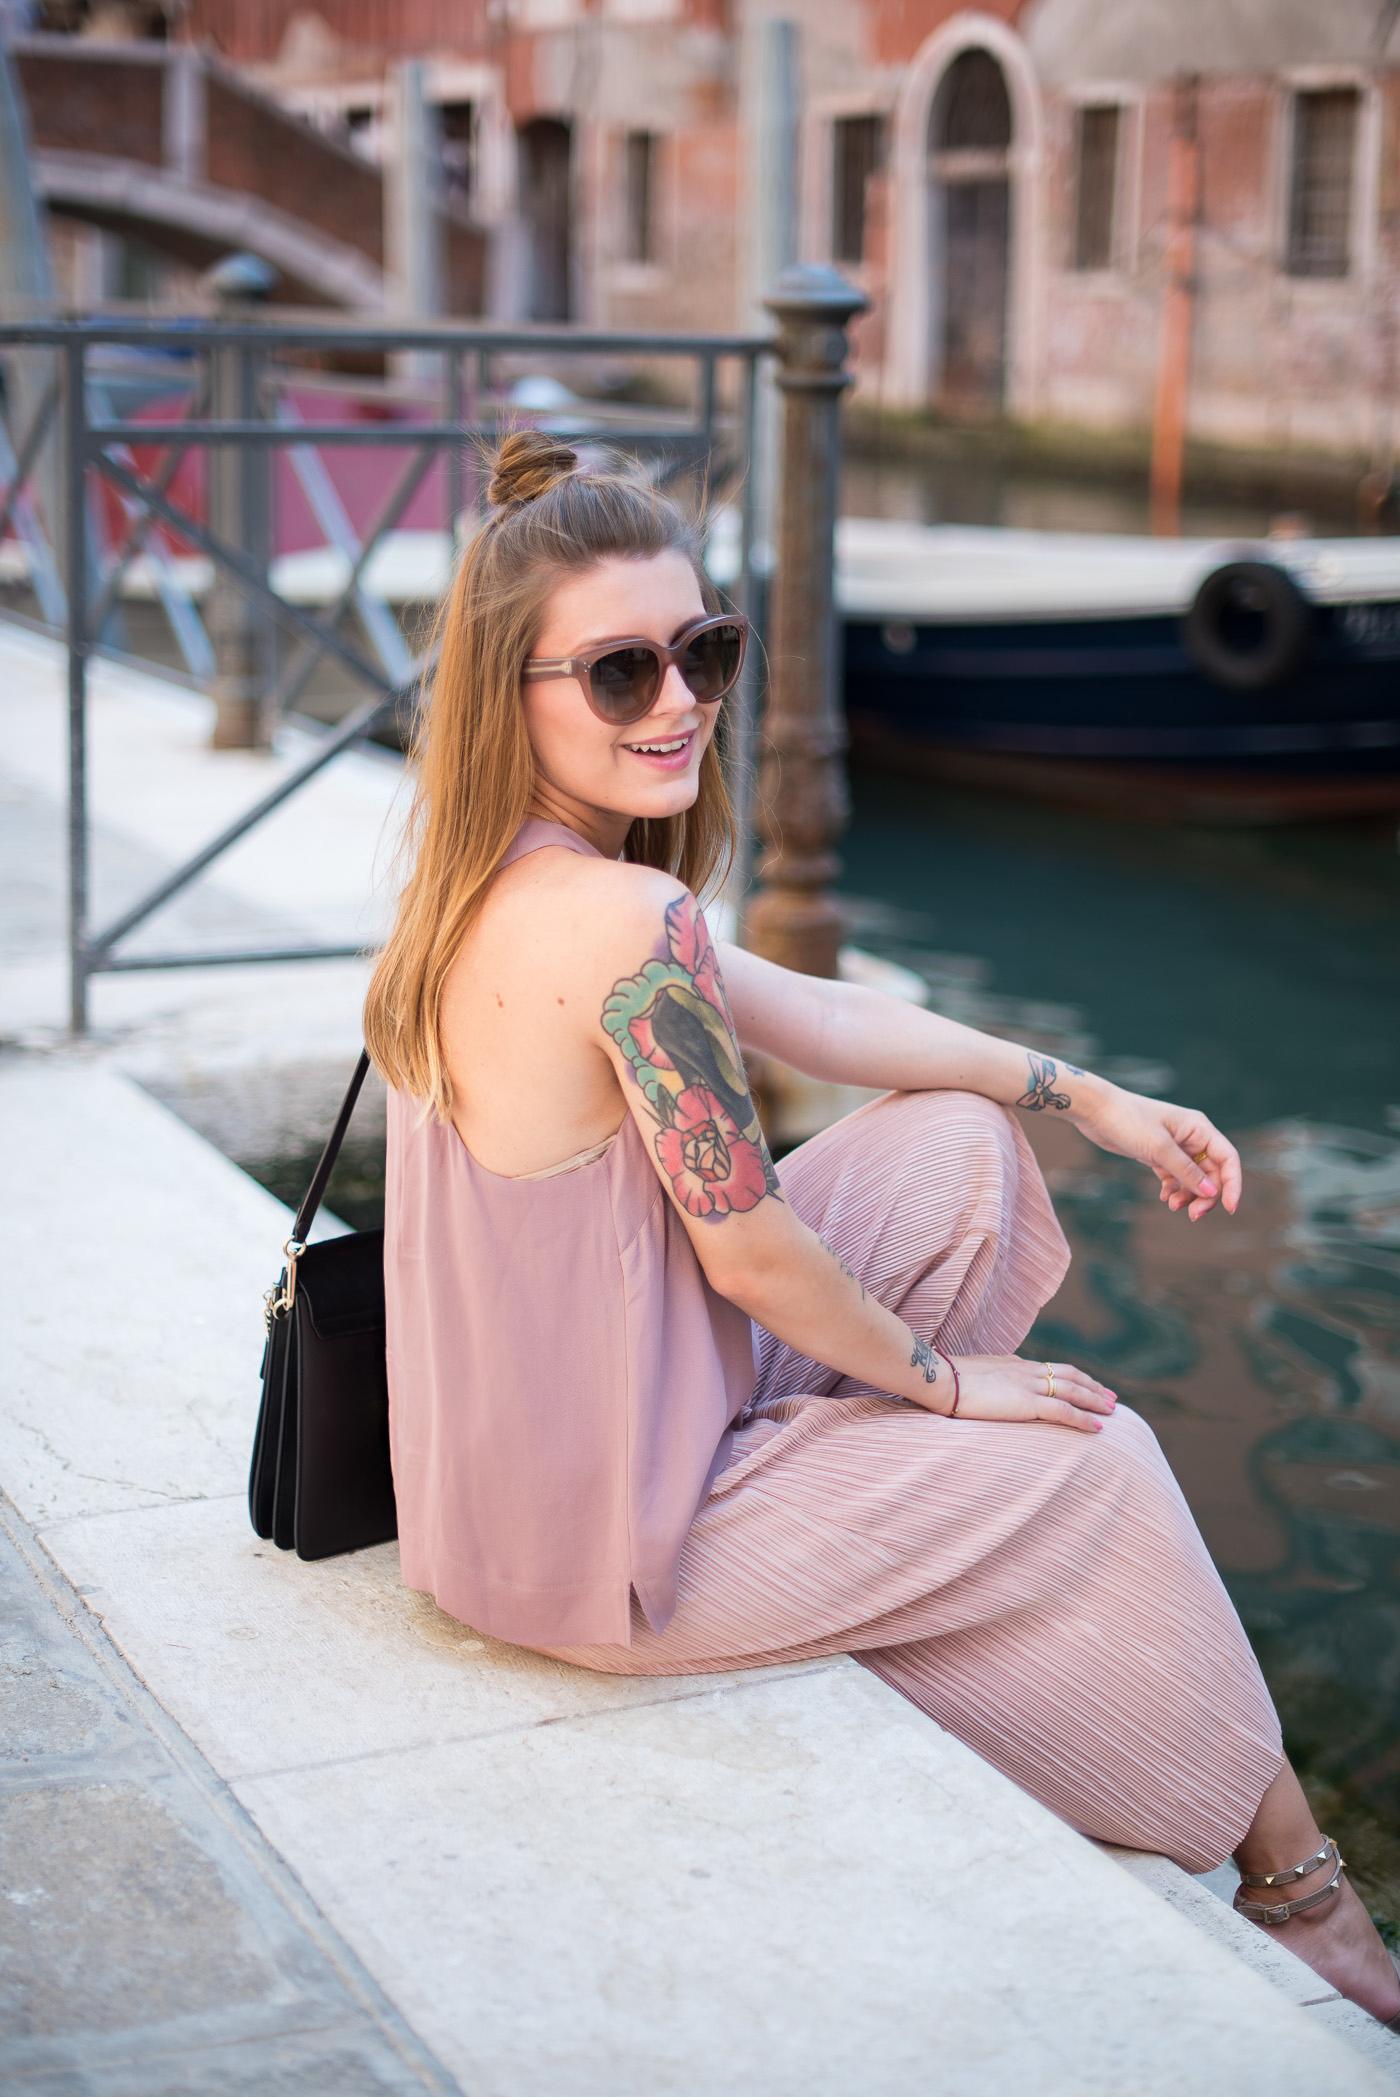 Candy_colors_culotte_outfit_in_Venezia_2